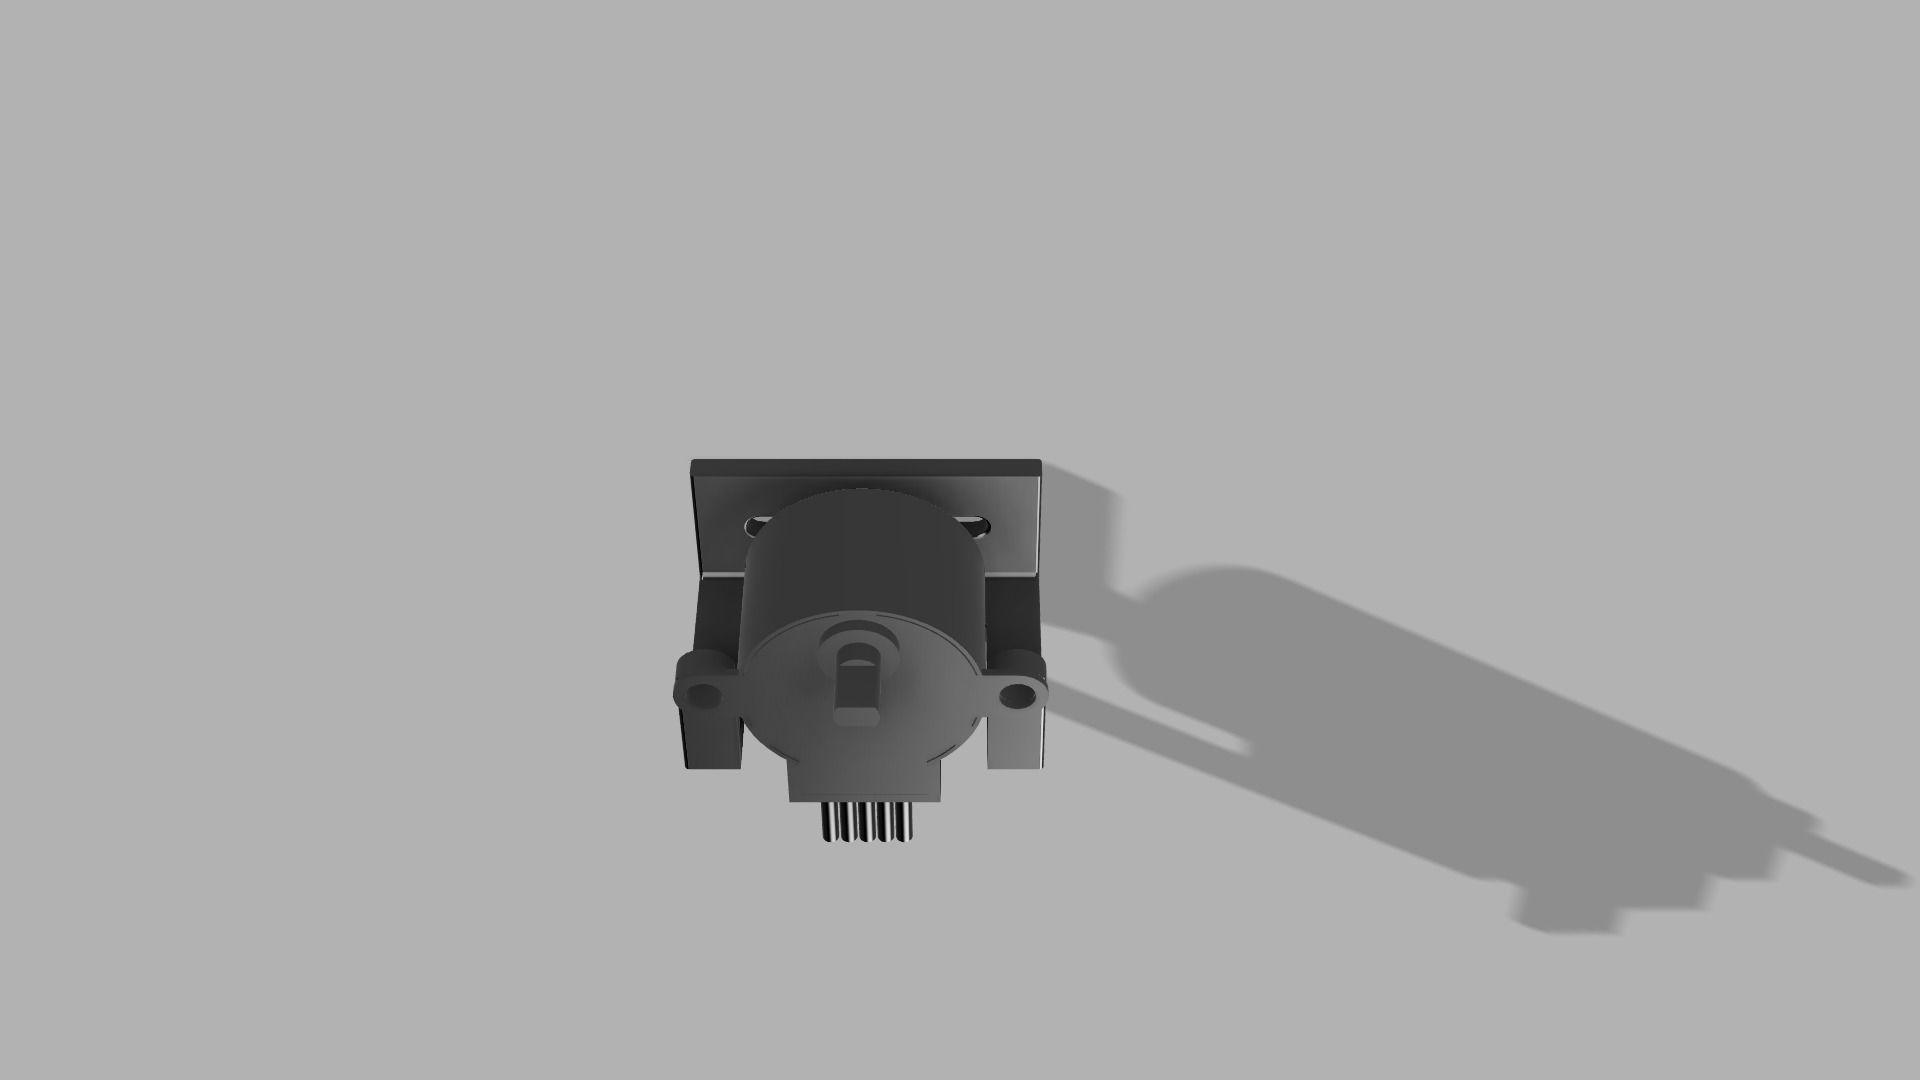 Vertical Mount for 28BYJ-48 5V Stepper Motor